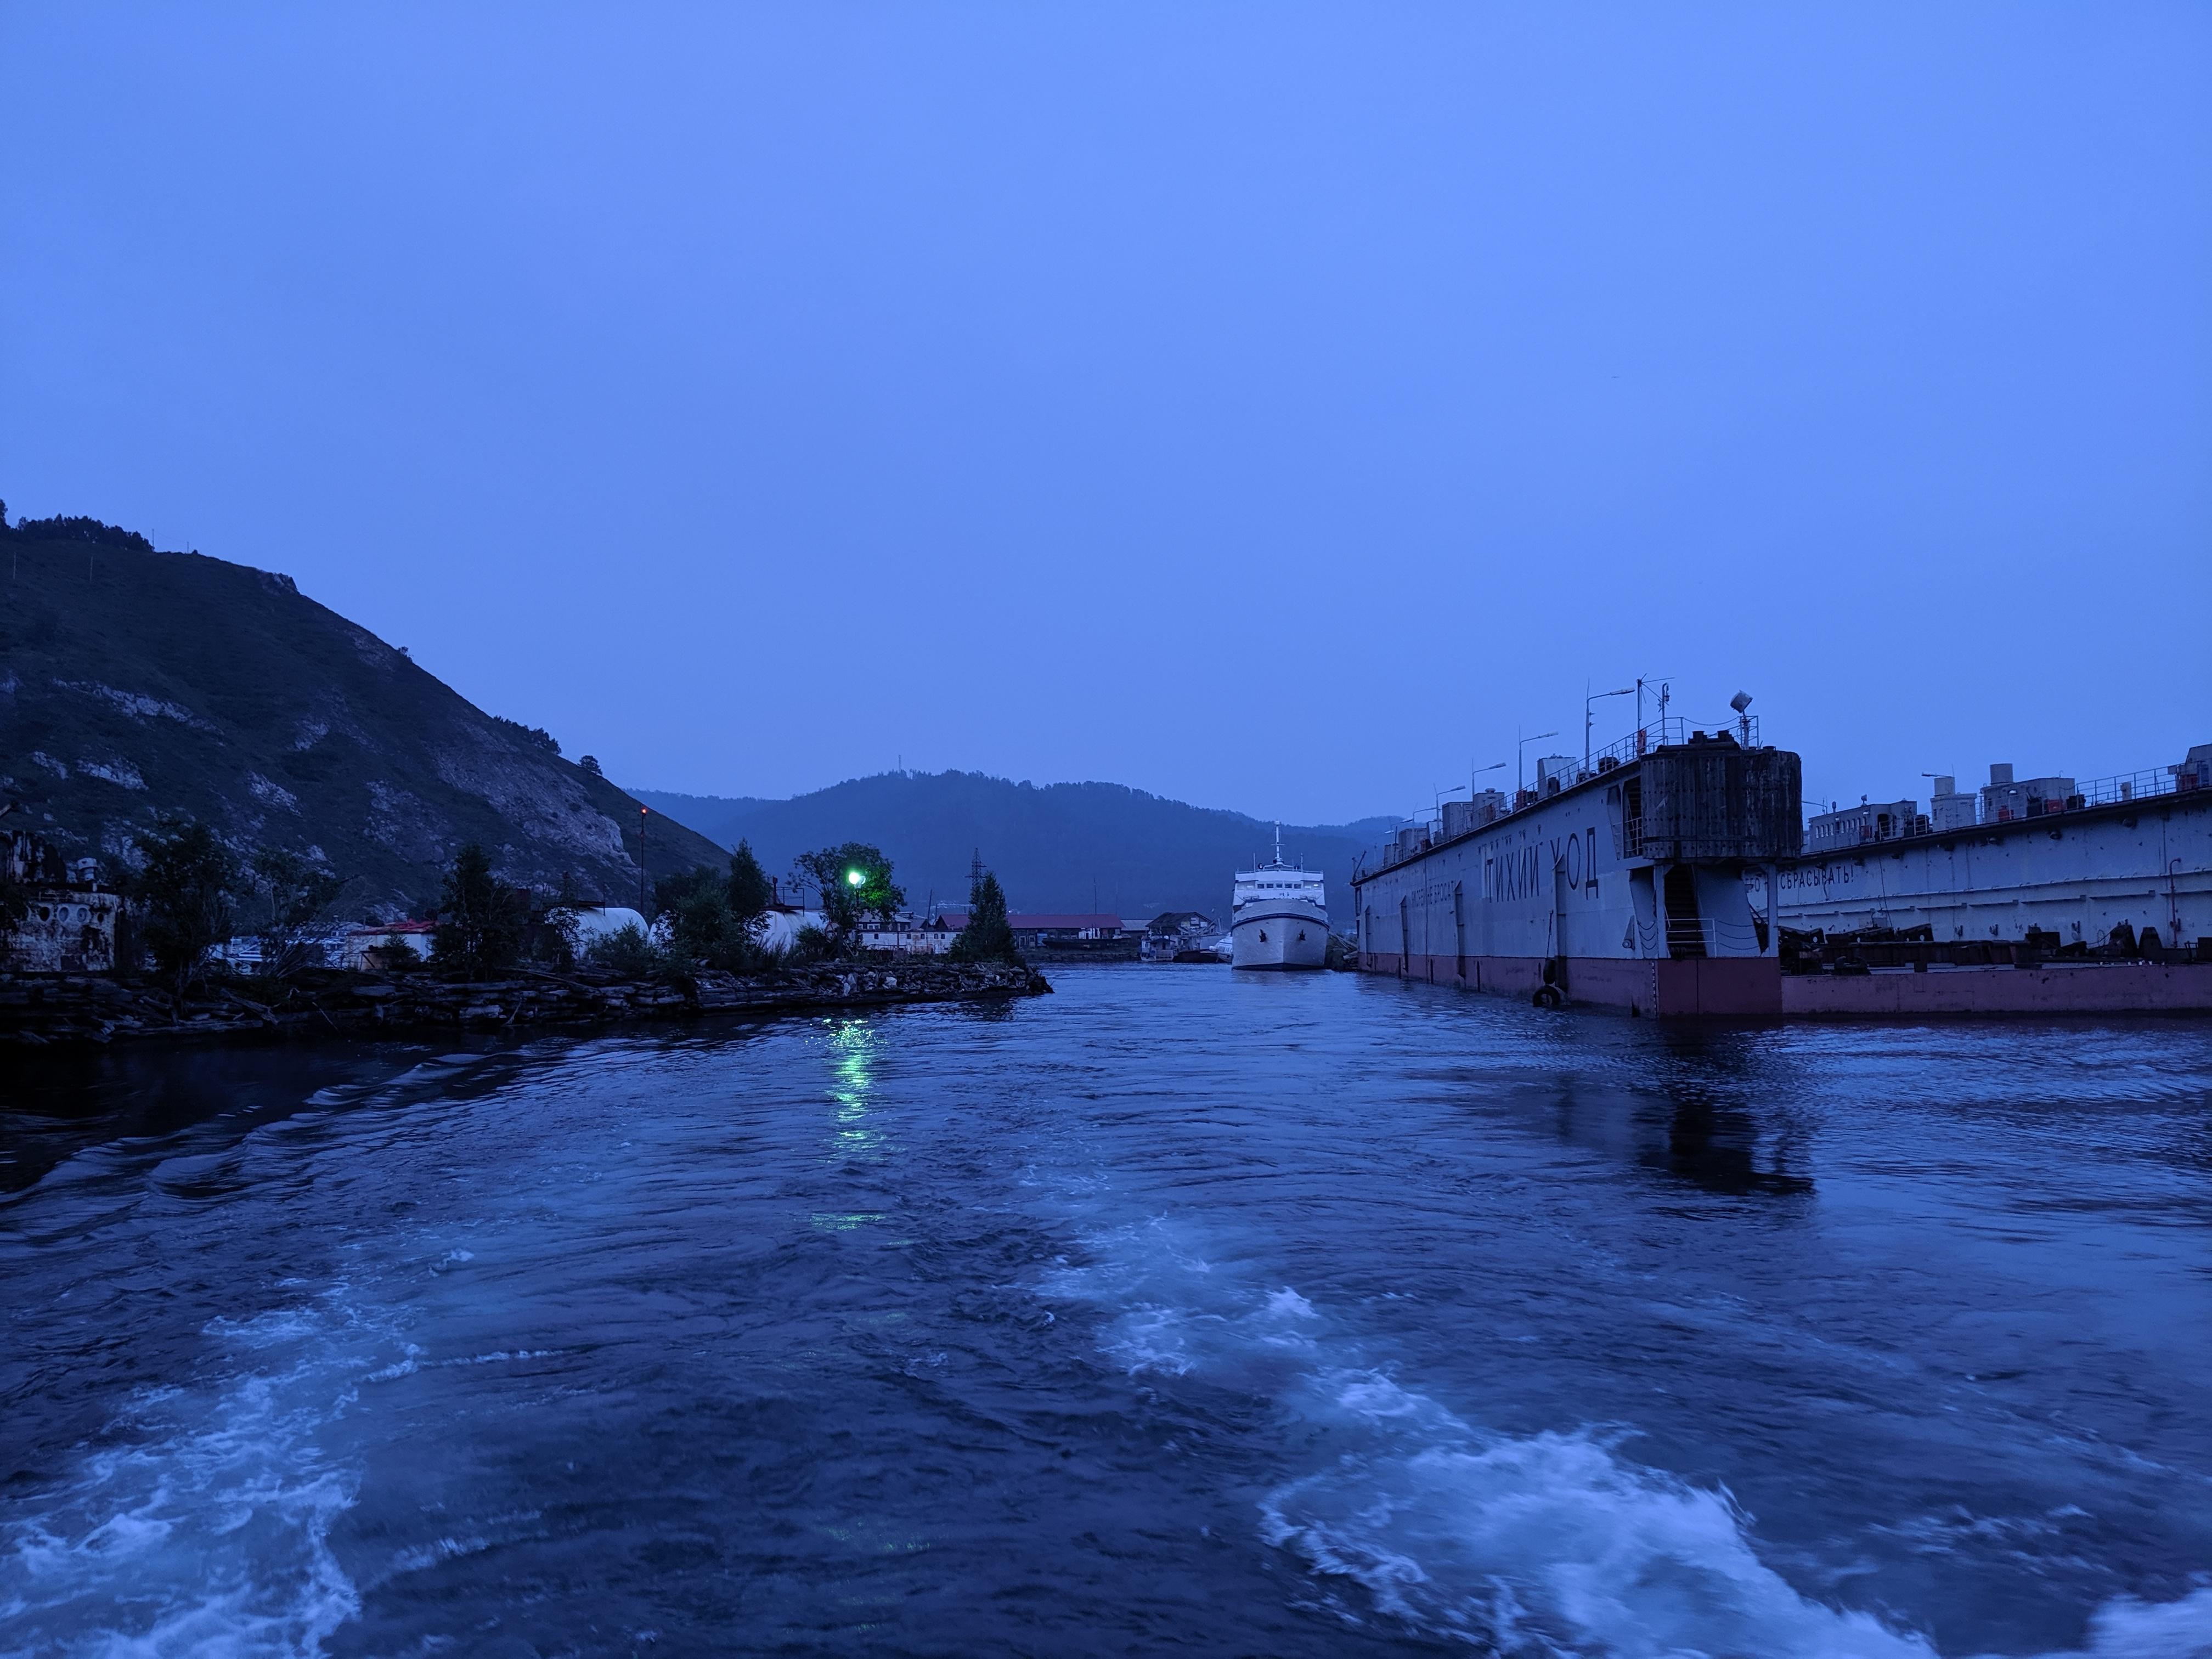 Taking the ferry across the Angara River near Listvyanka, Russia